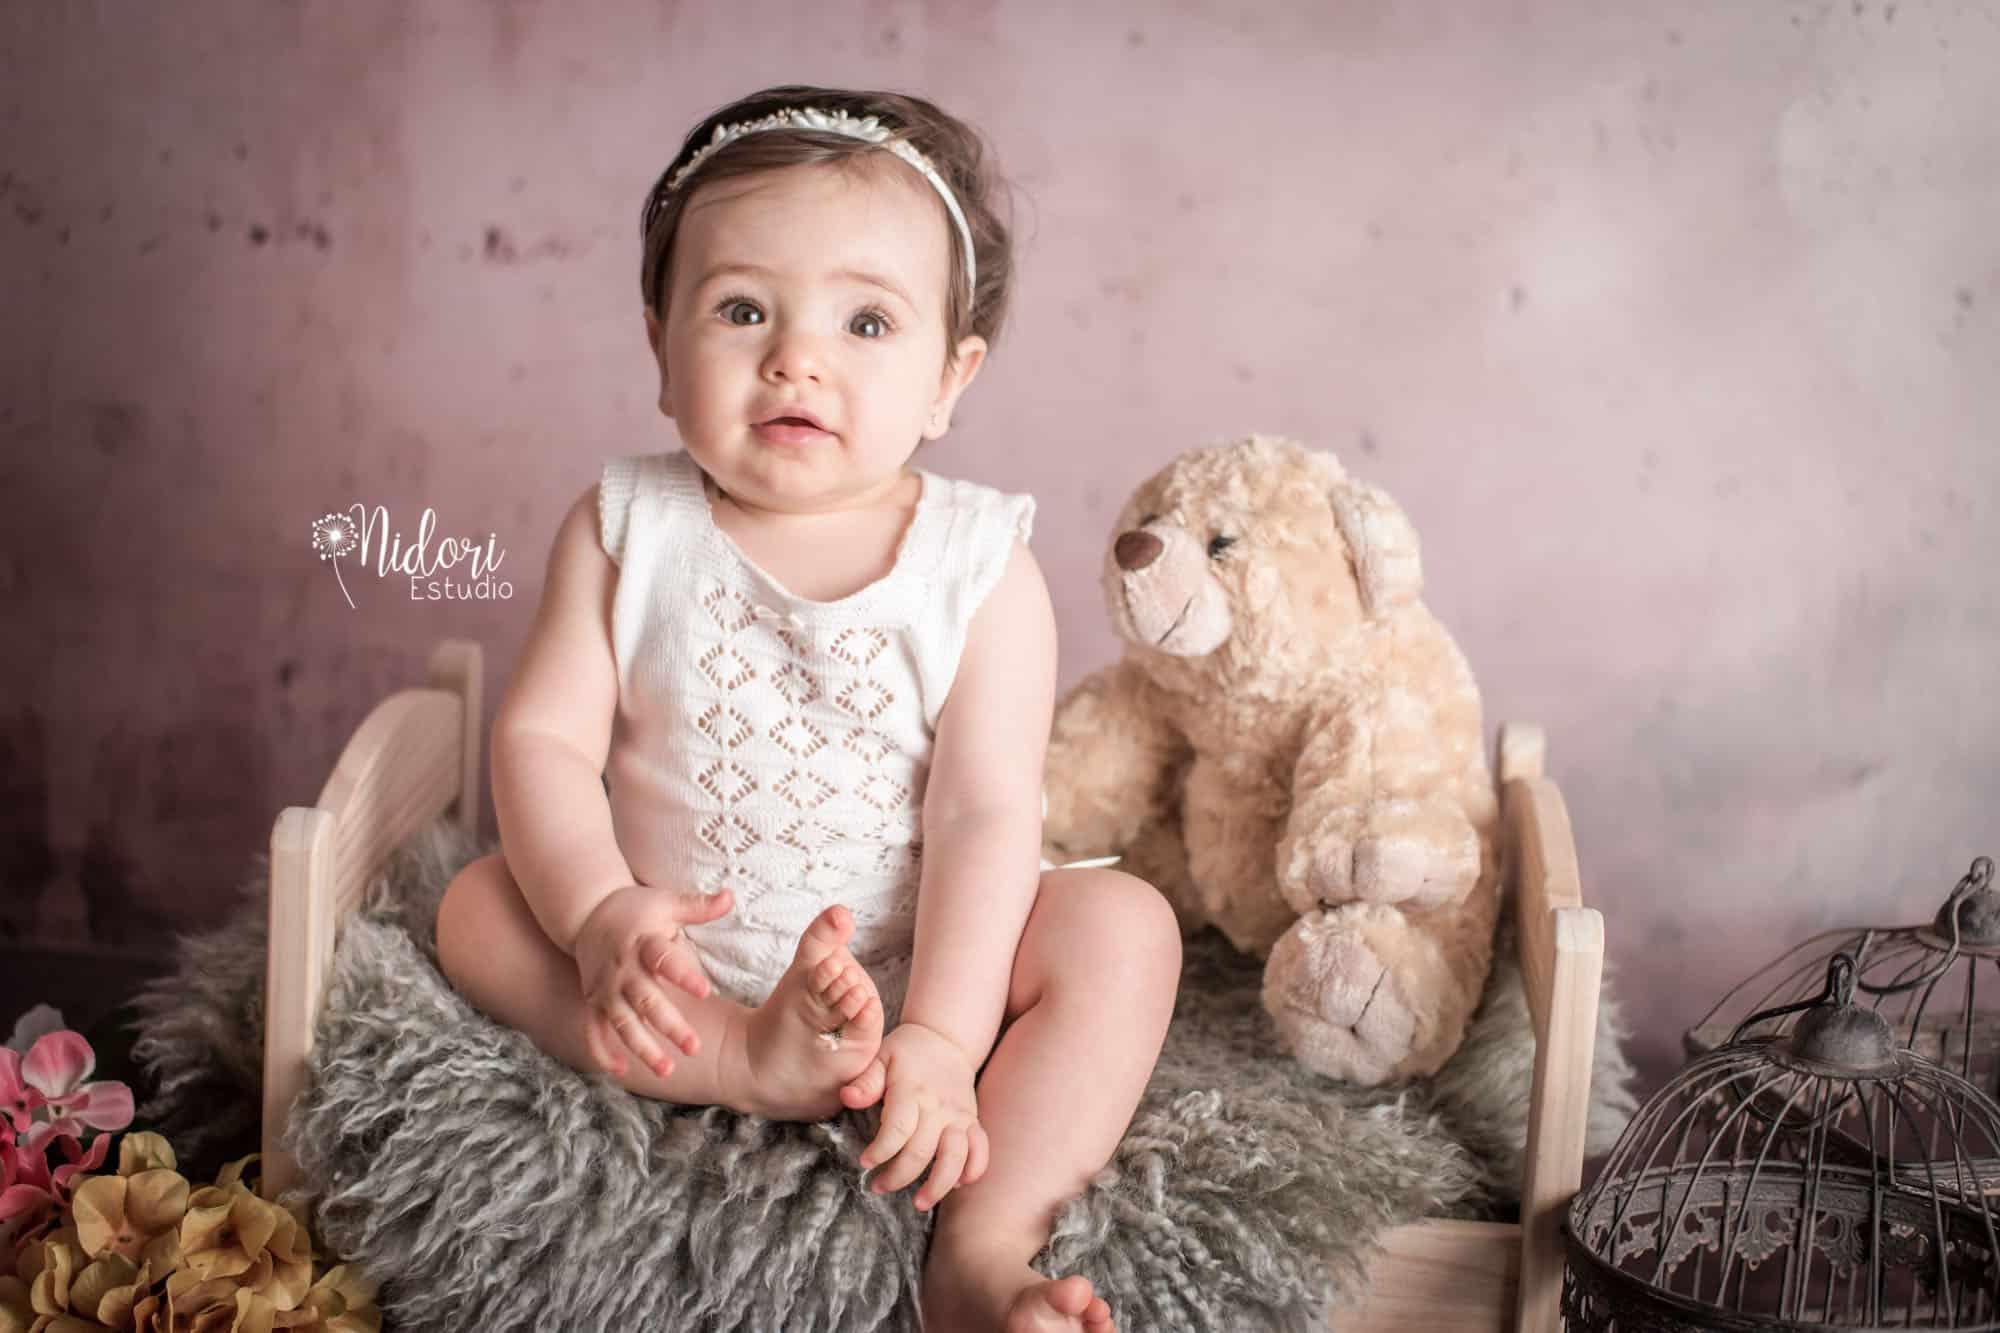 niños-infantiles-sesion-infantil-fotografia-nidoriestudio-fotos-valencia-almazora-castellon-españa-spain-17